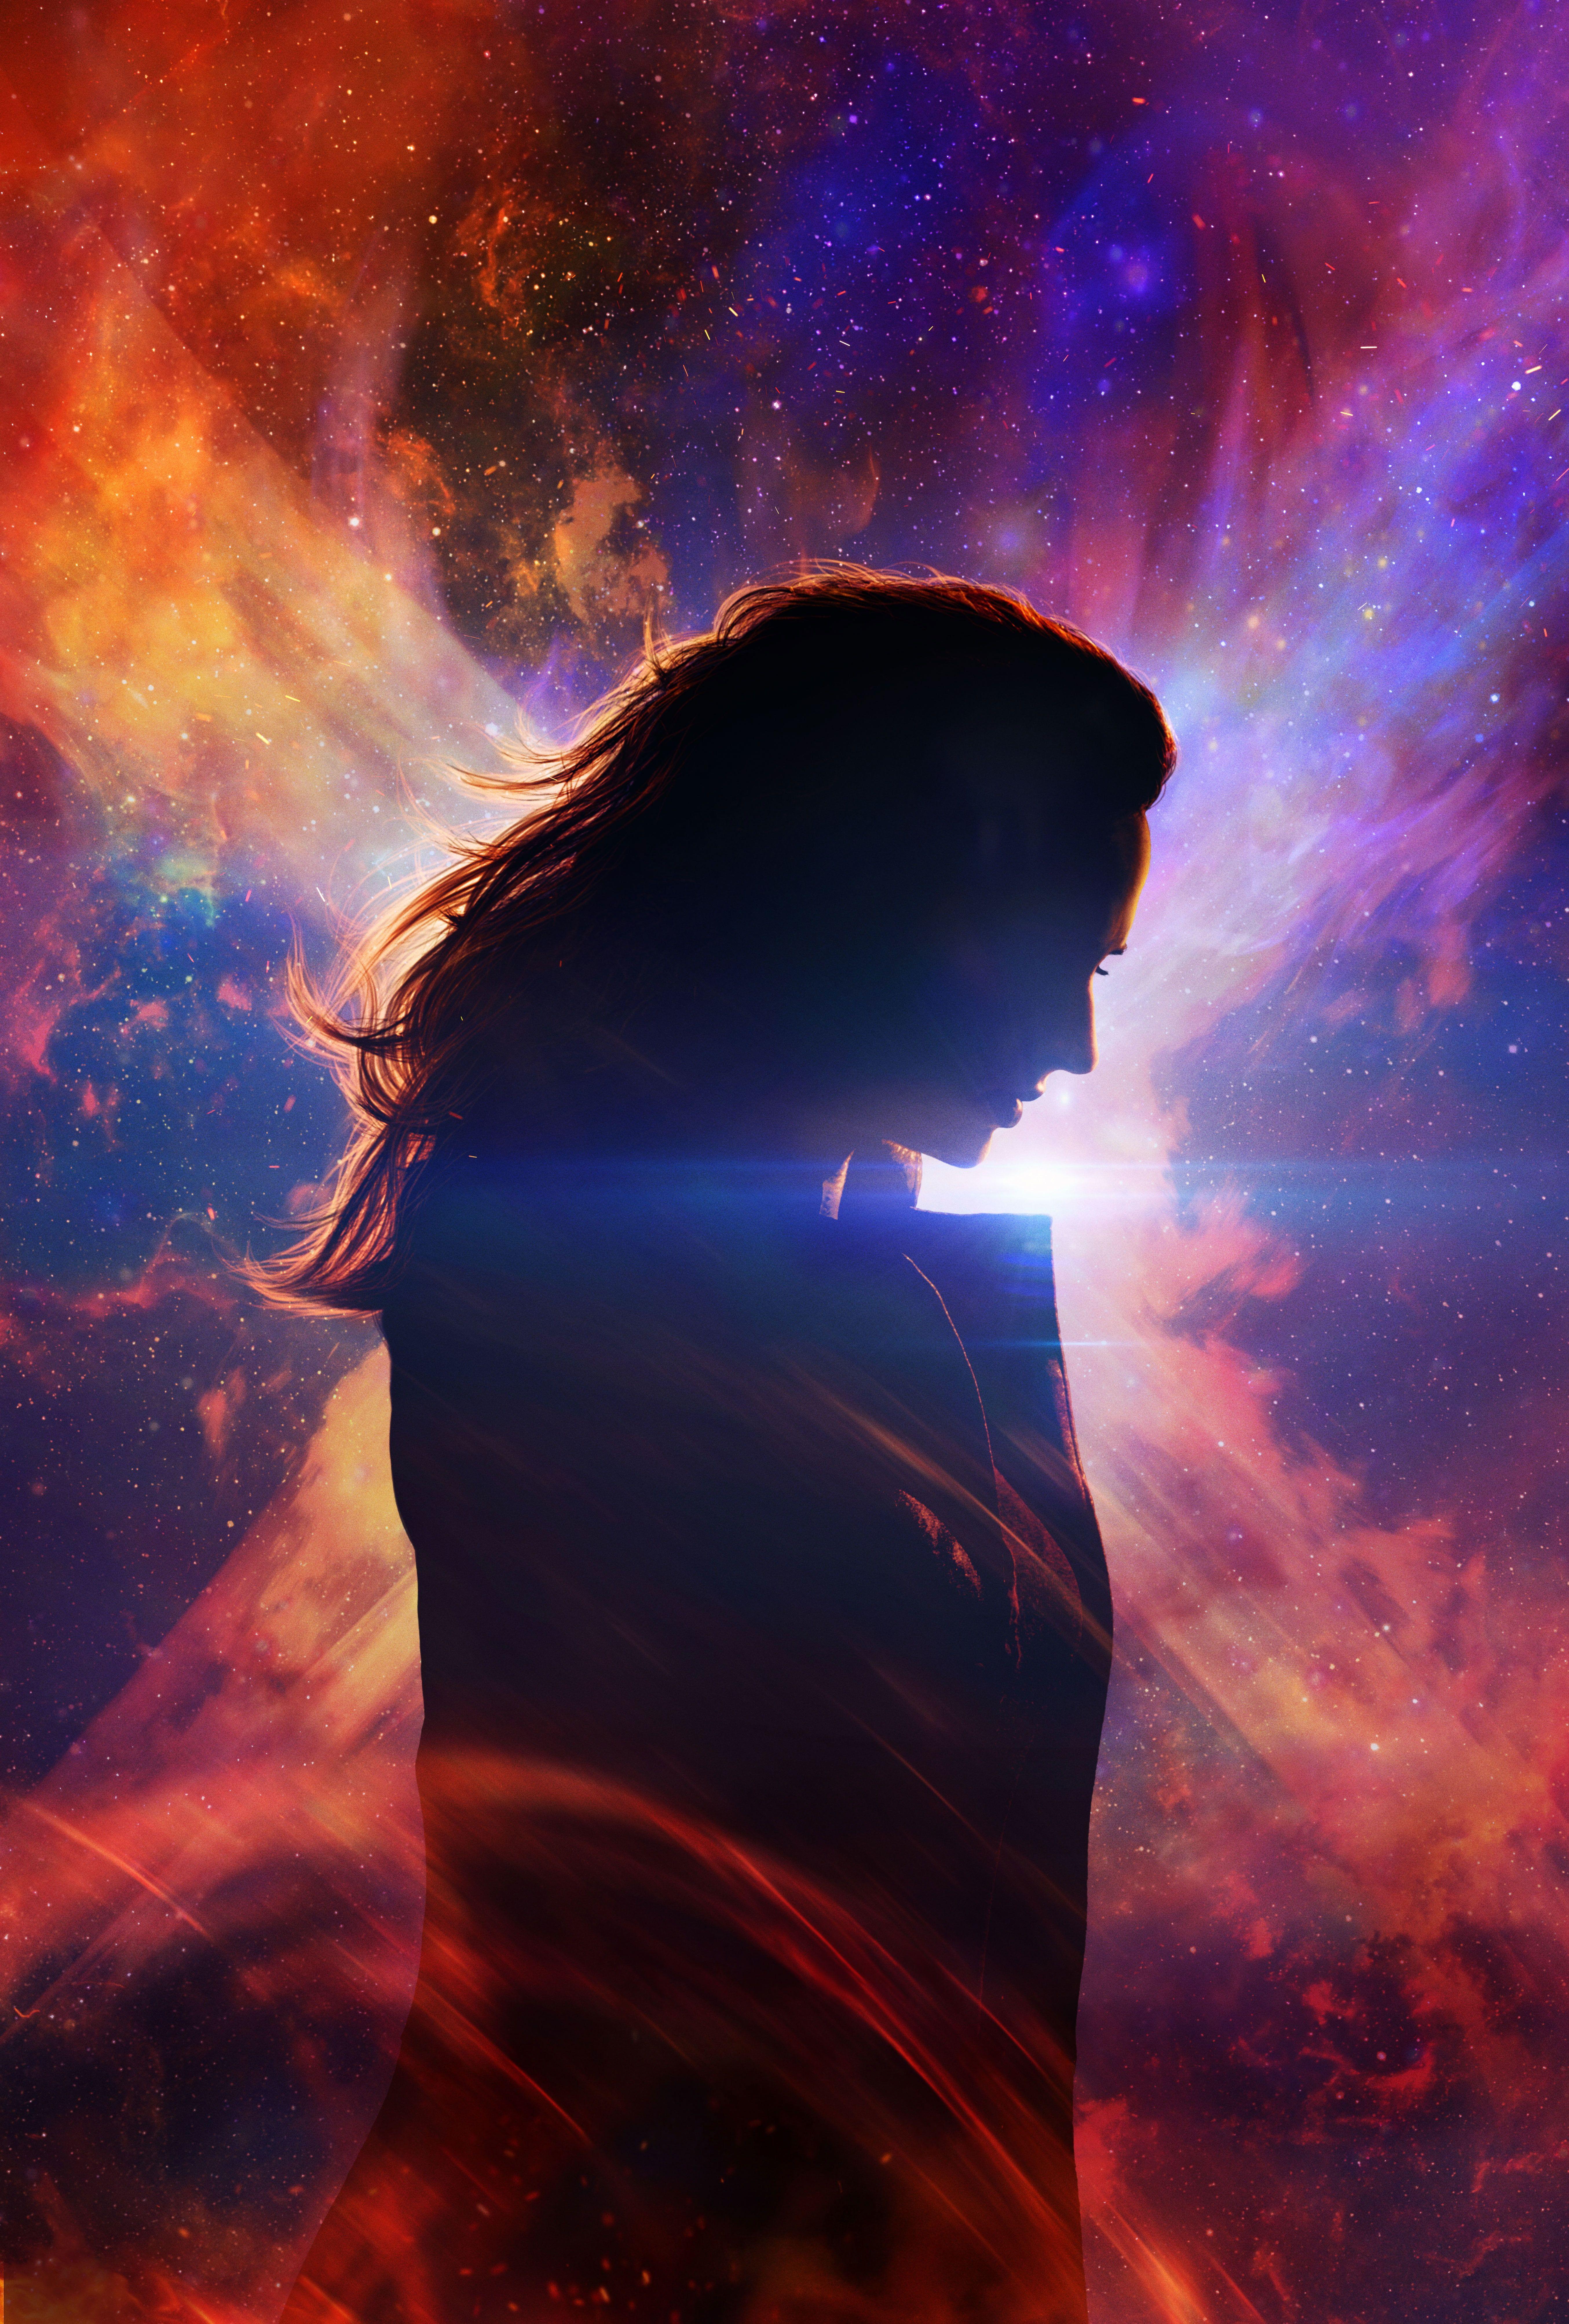 Xmen Dark Phoenix 2019 Movie Poster 8K wallpaper